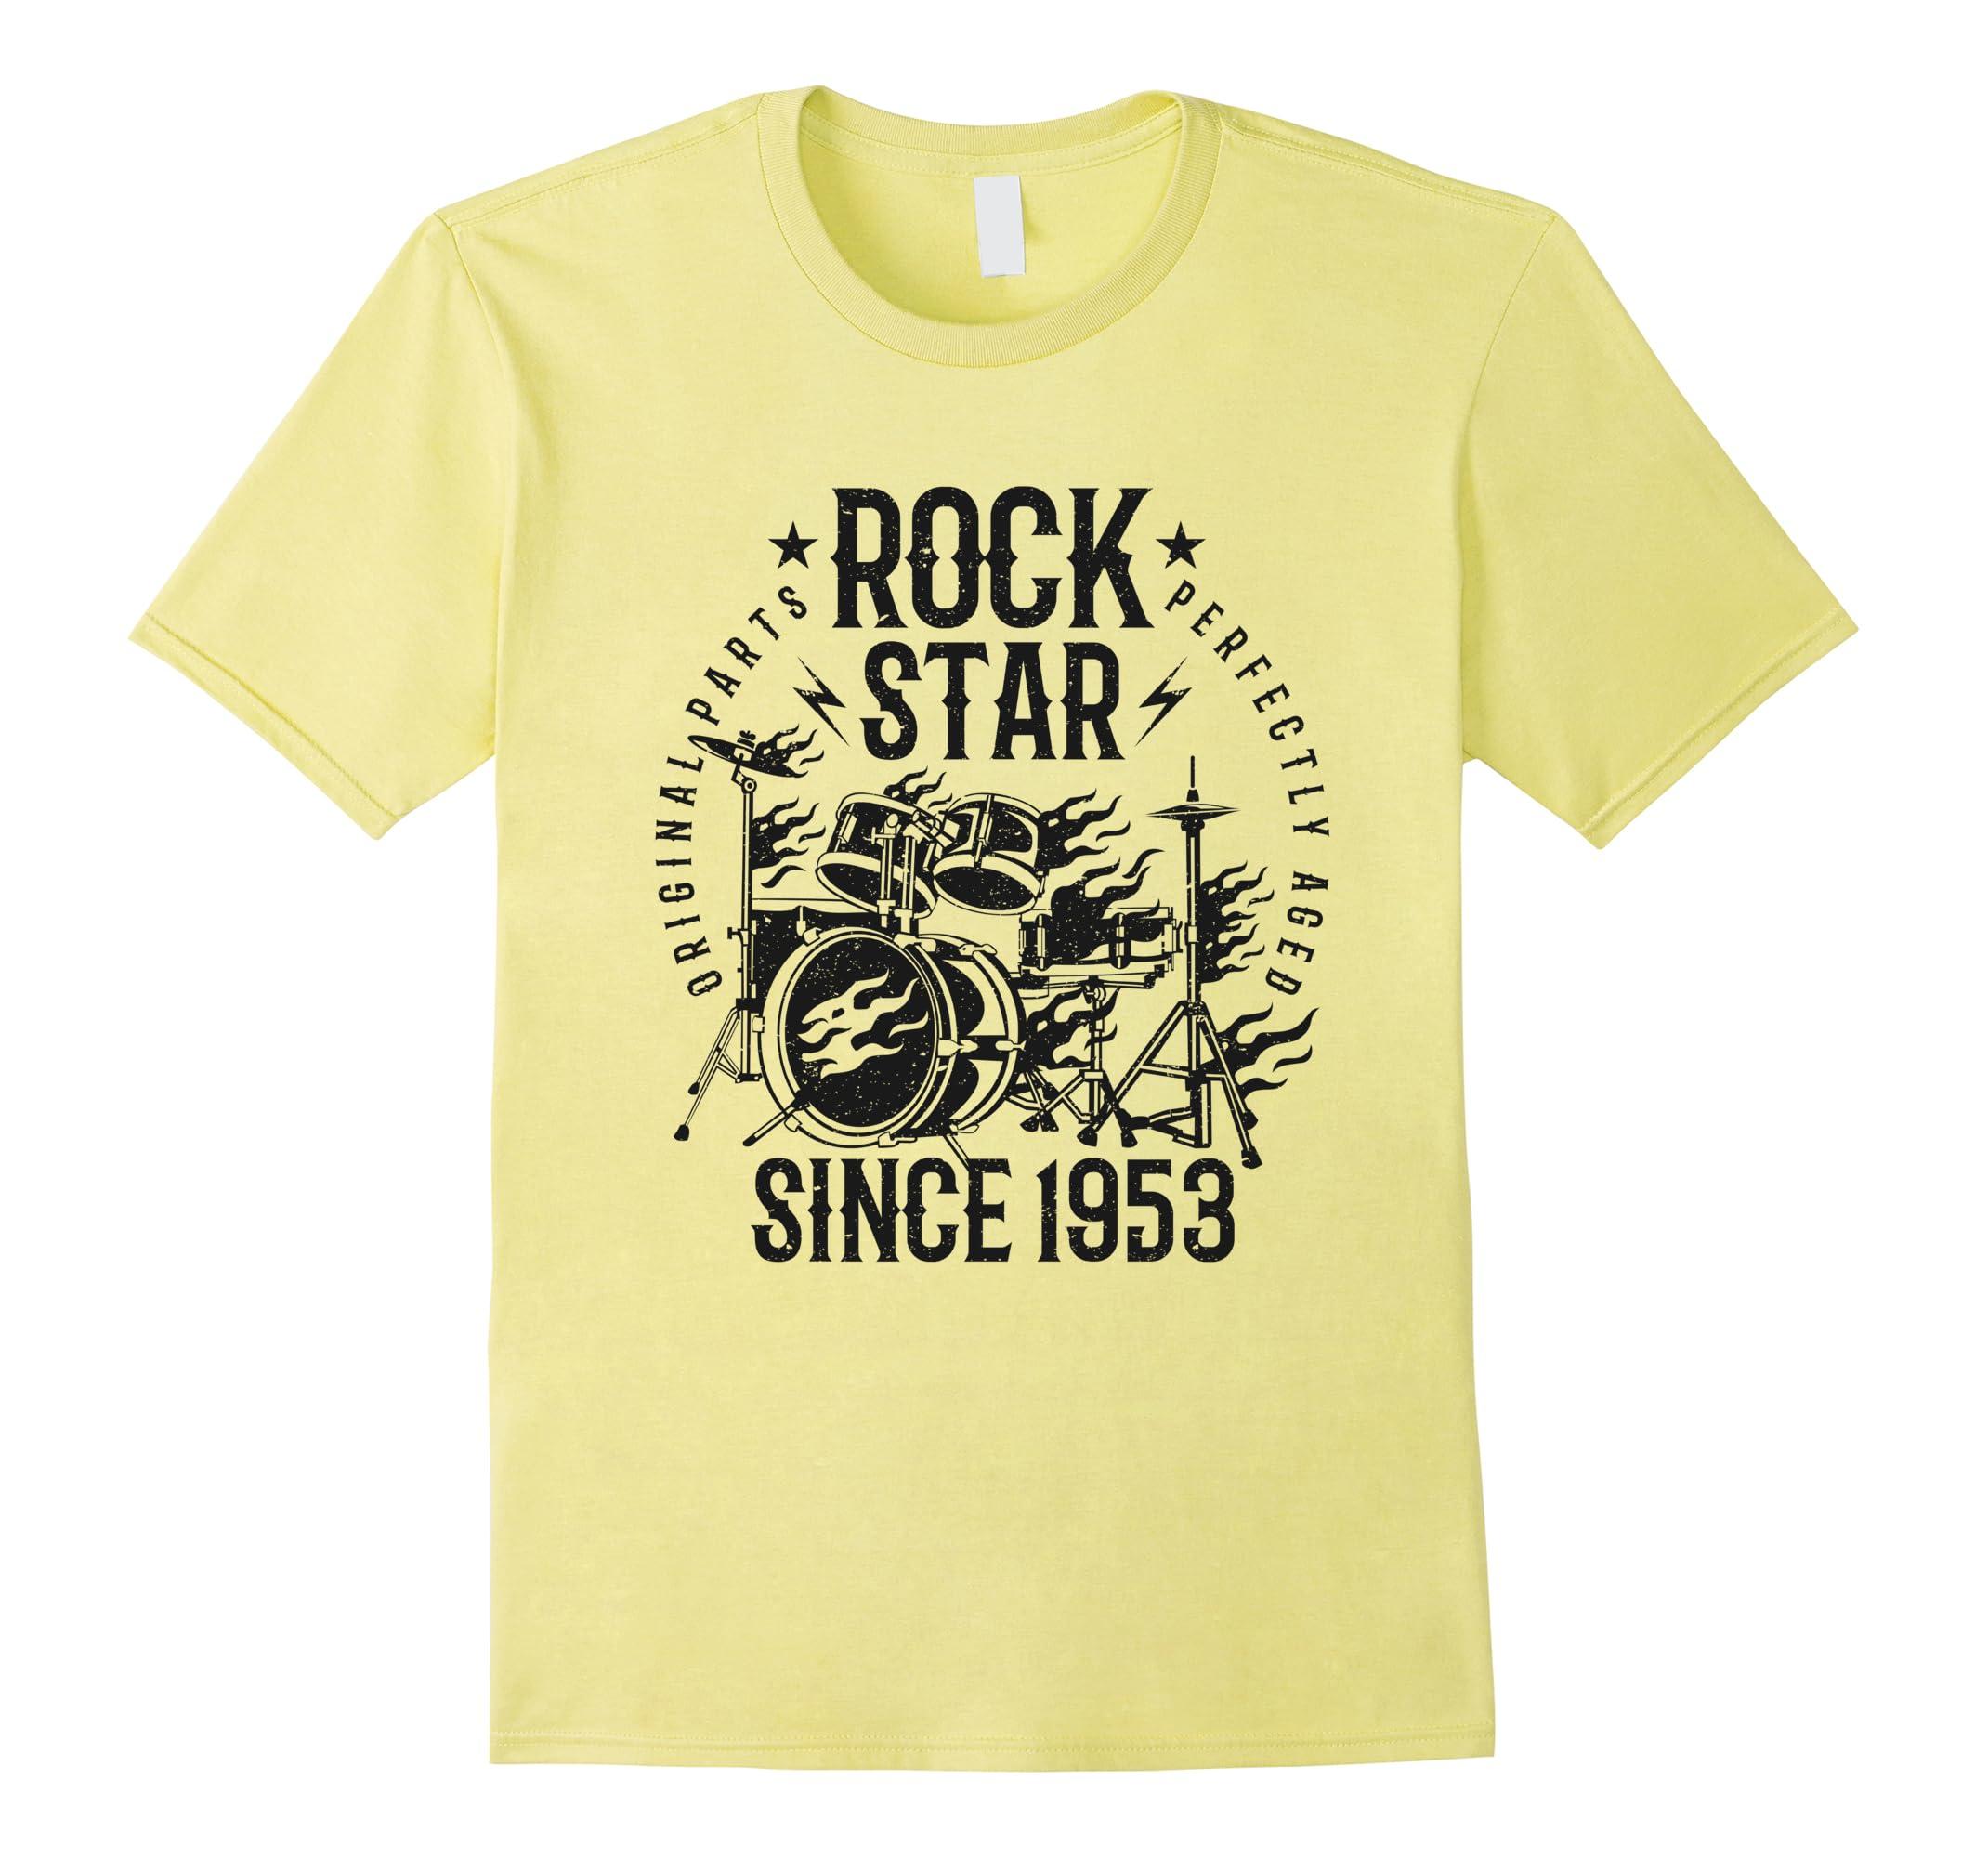 65th Birthday Gift T Shirt Rock Star Since 1953 Grey RT